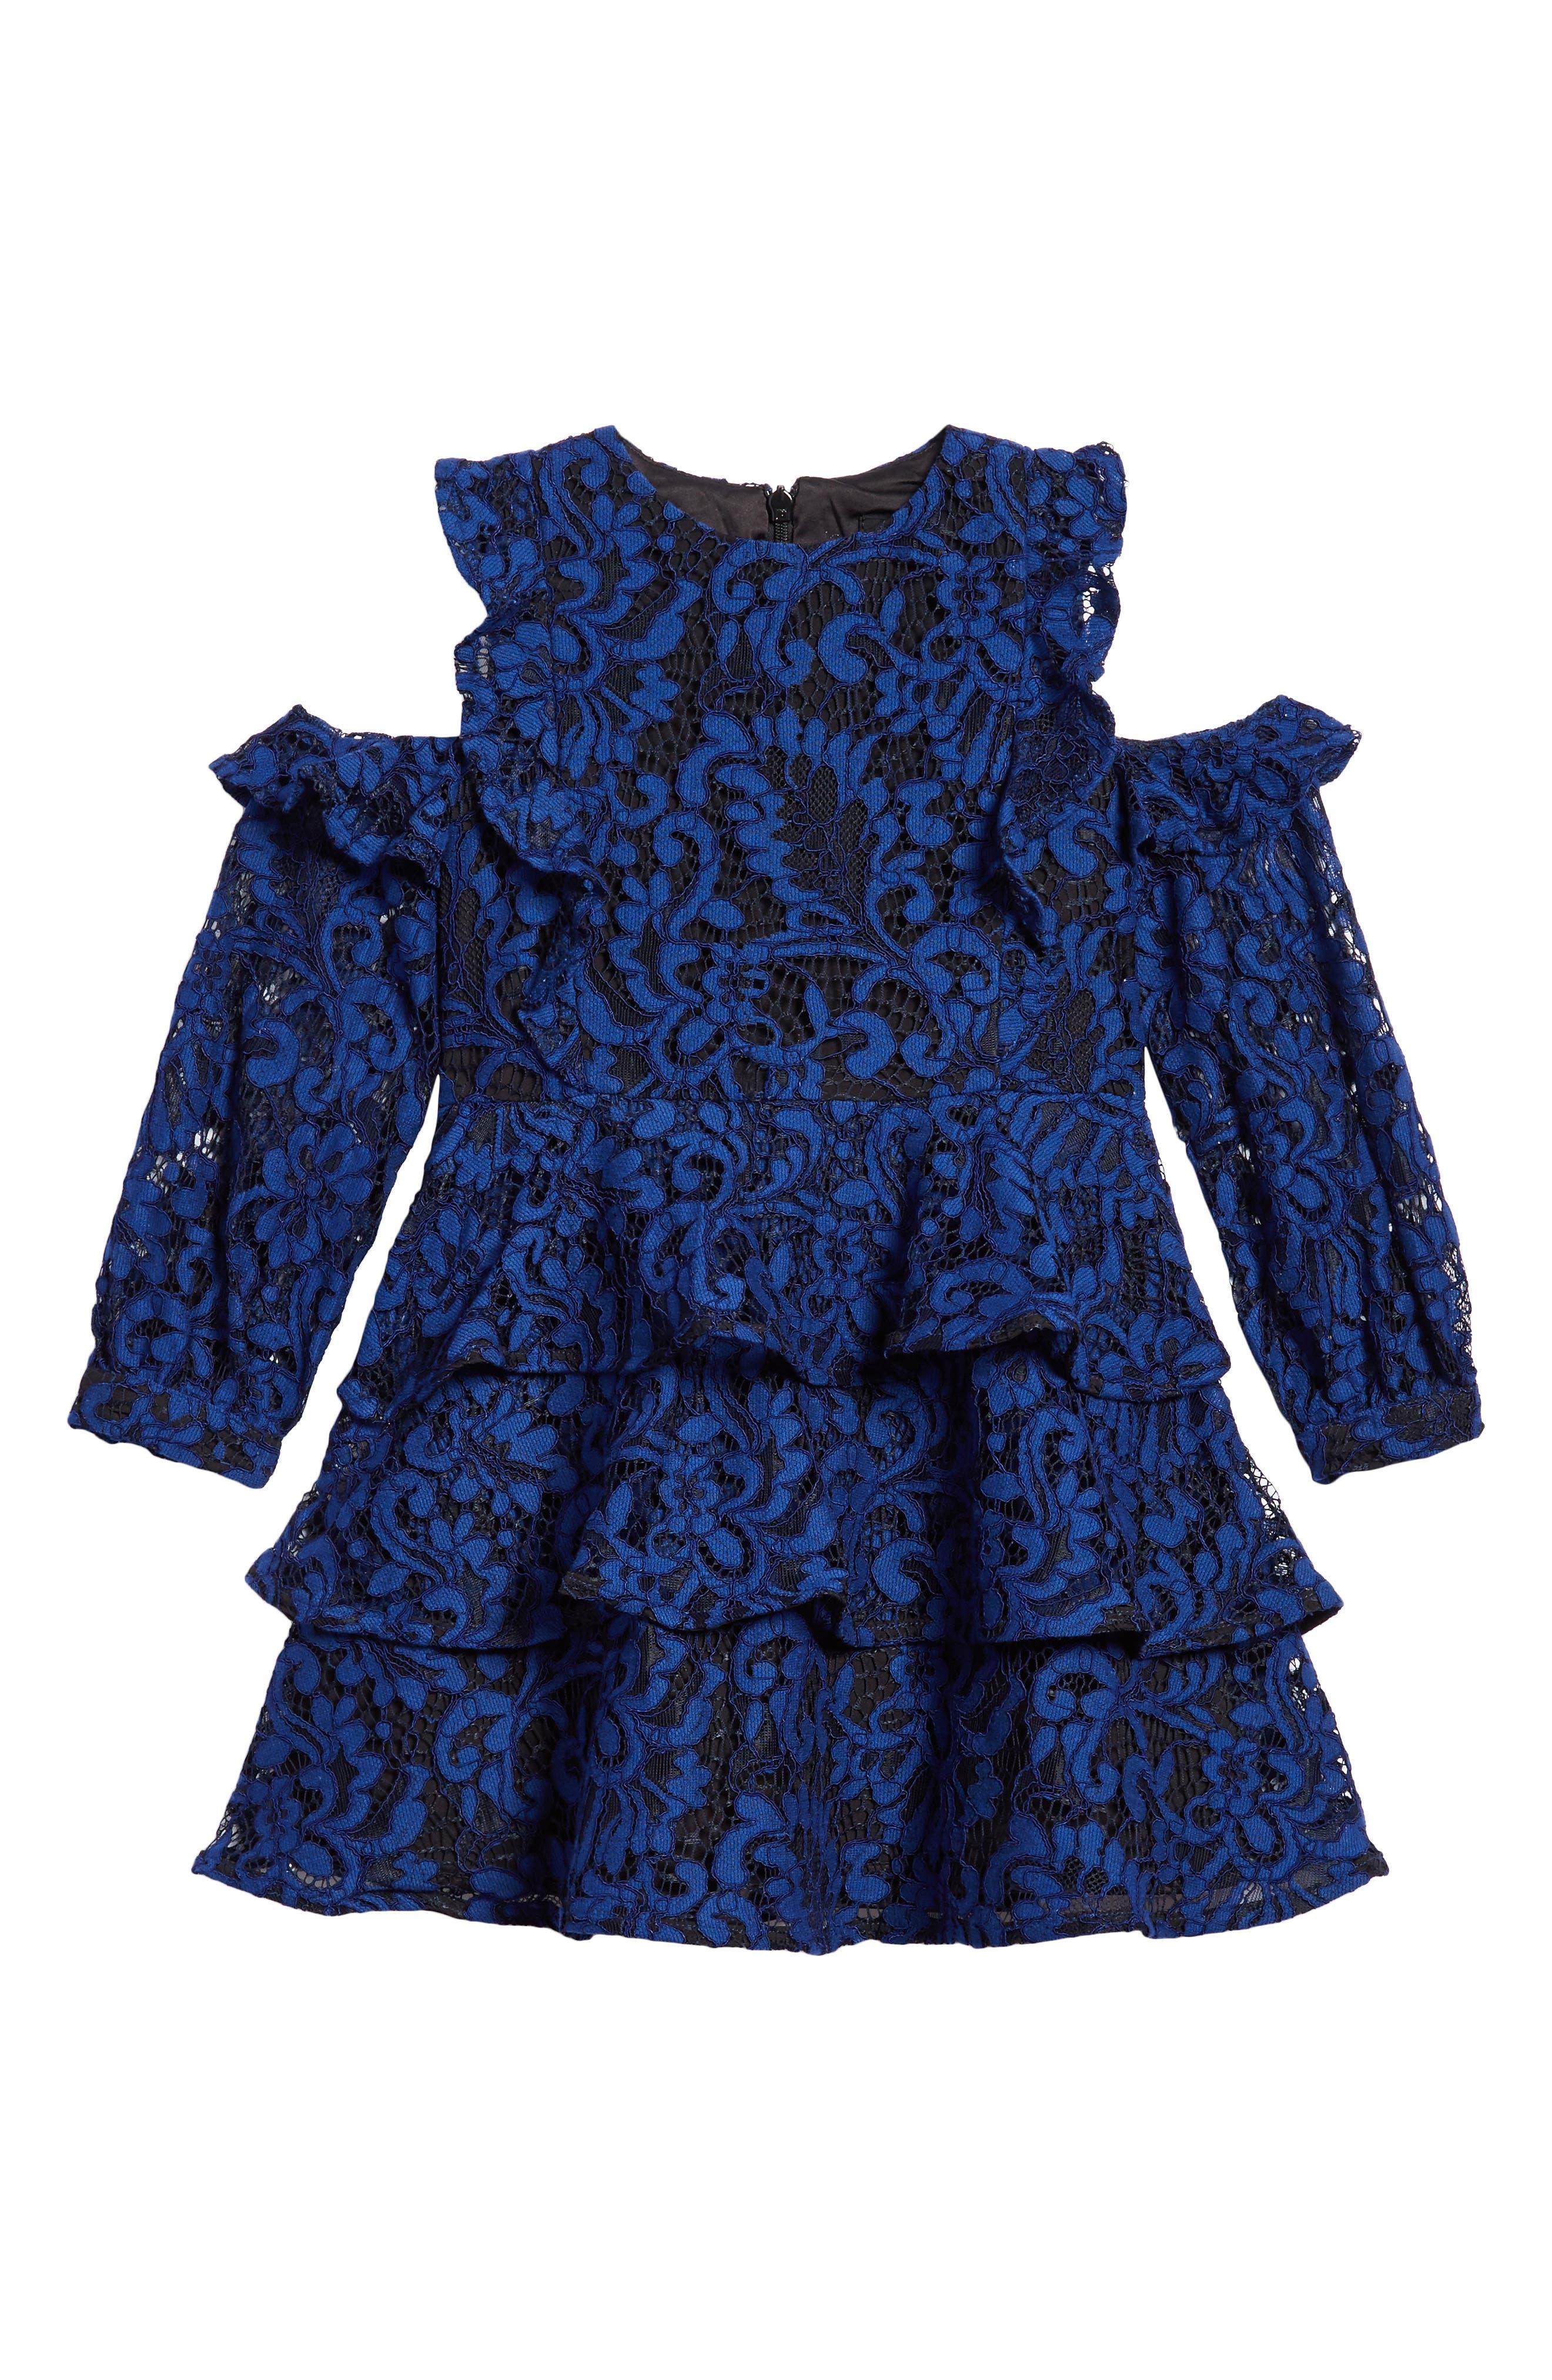 Ruffle Lace Cold Shoulder Dress,                             Main thumbnail 1, color,                             412